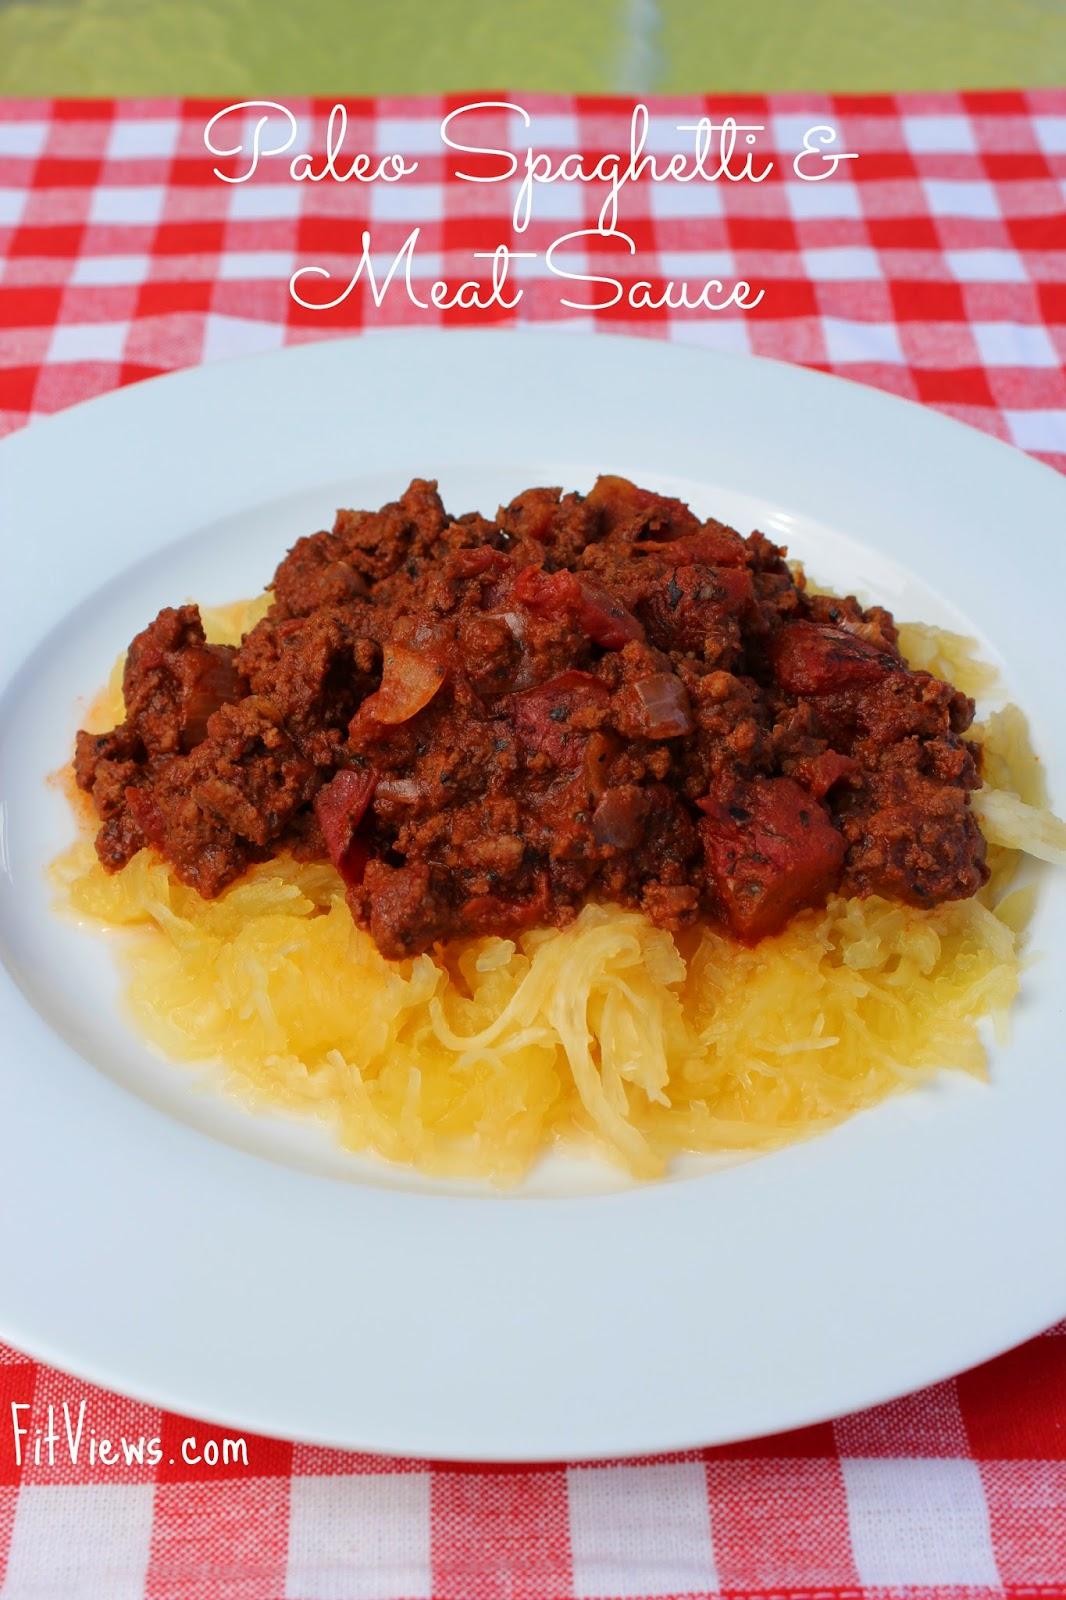 Paleo Spaghetti Recipe